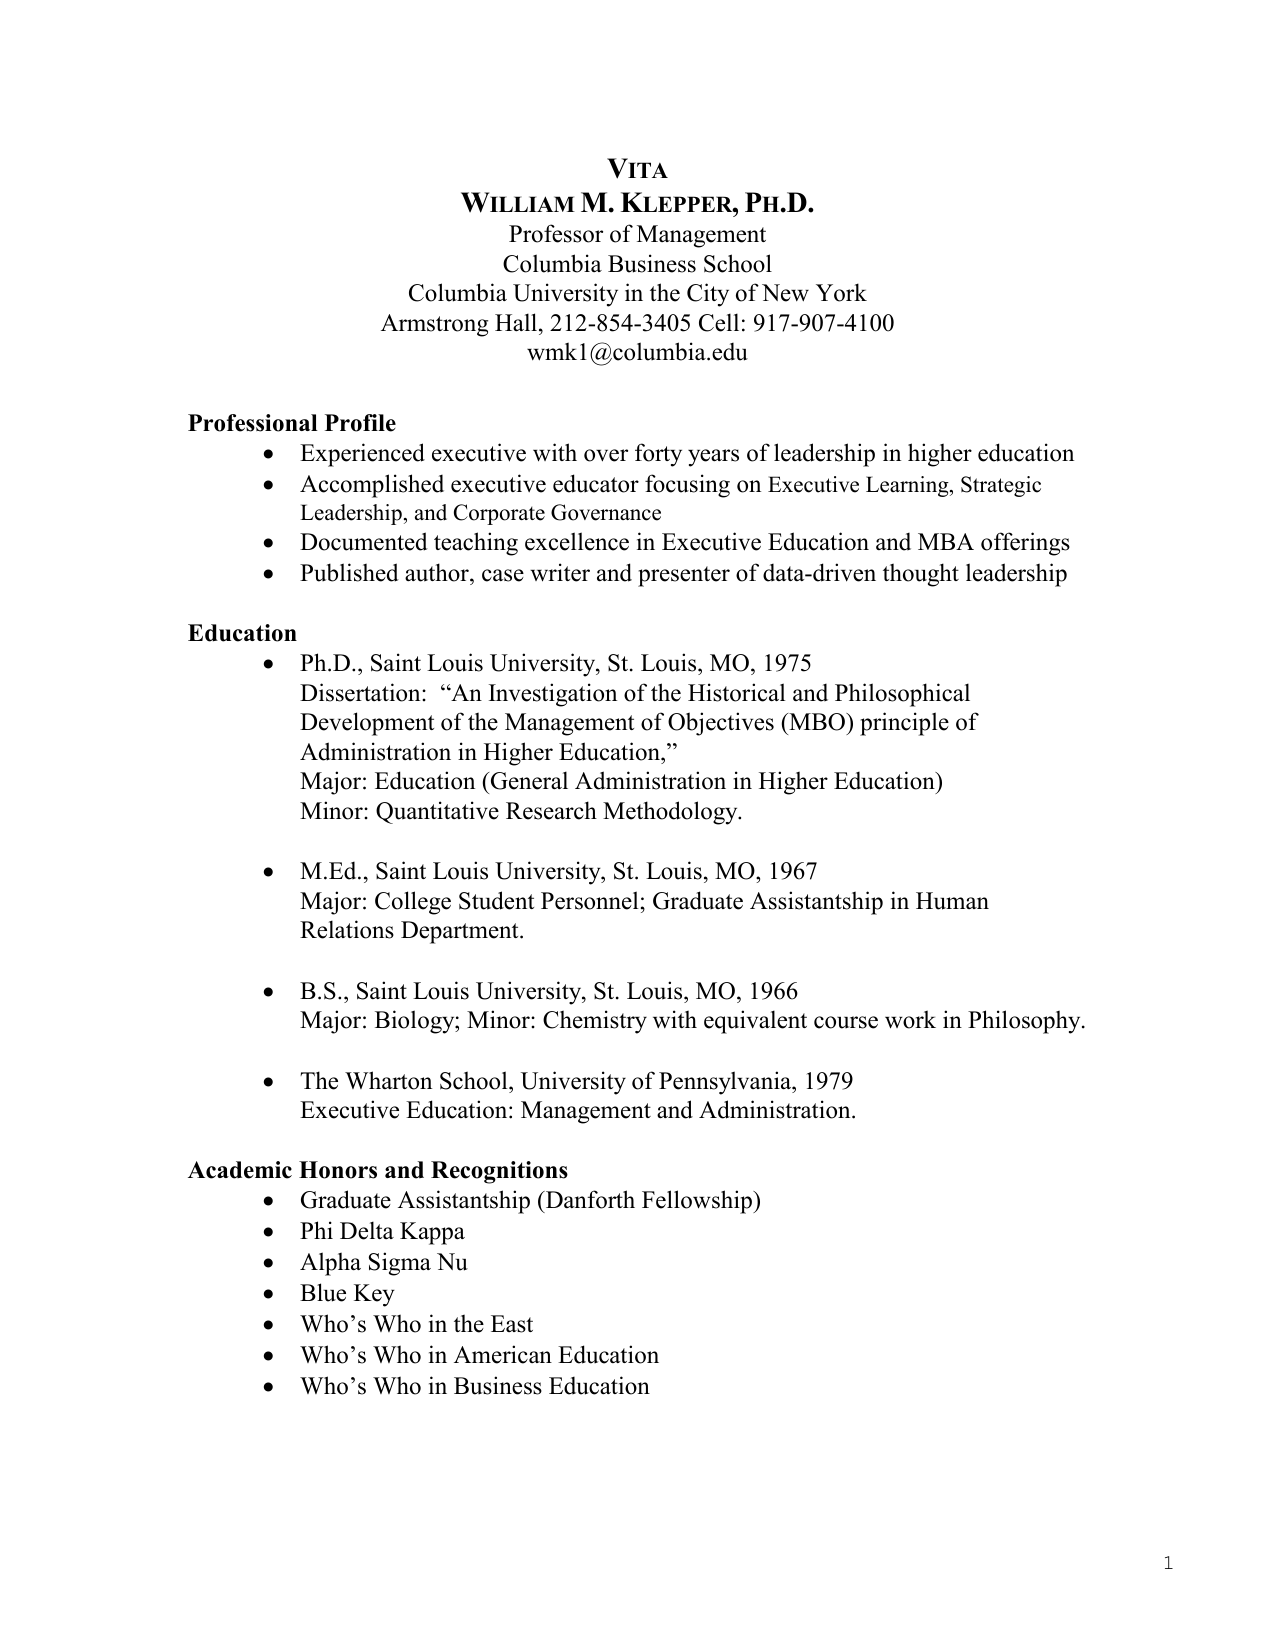 historical development of business education